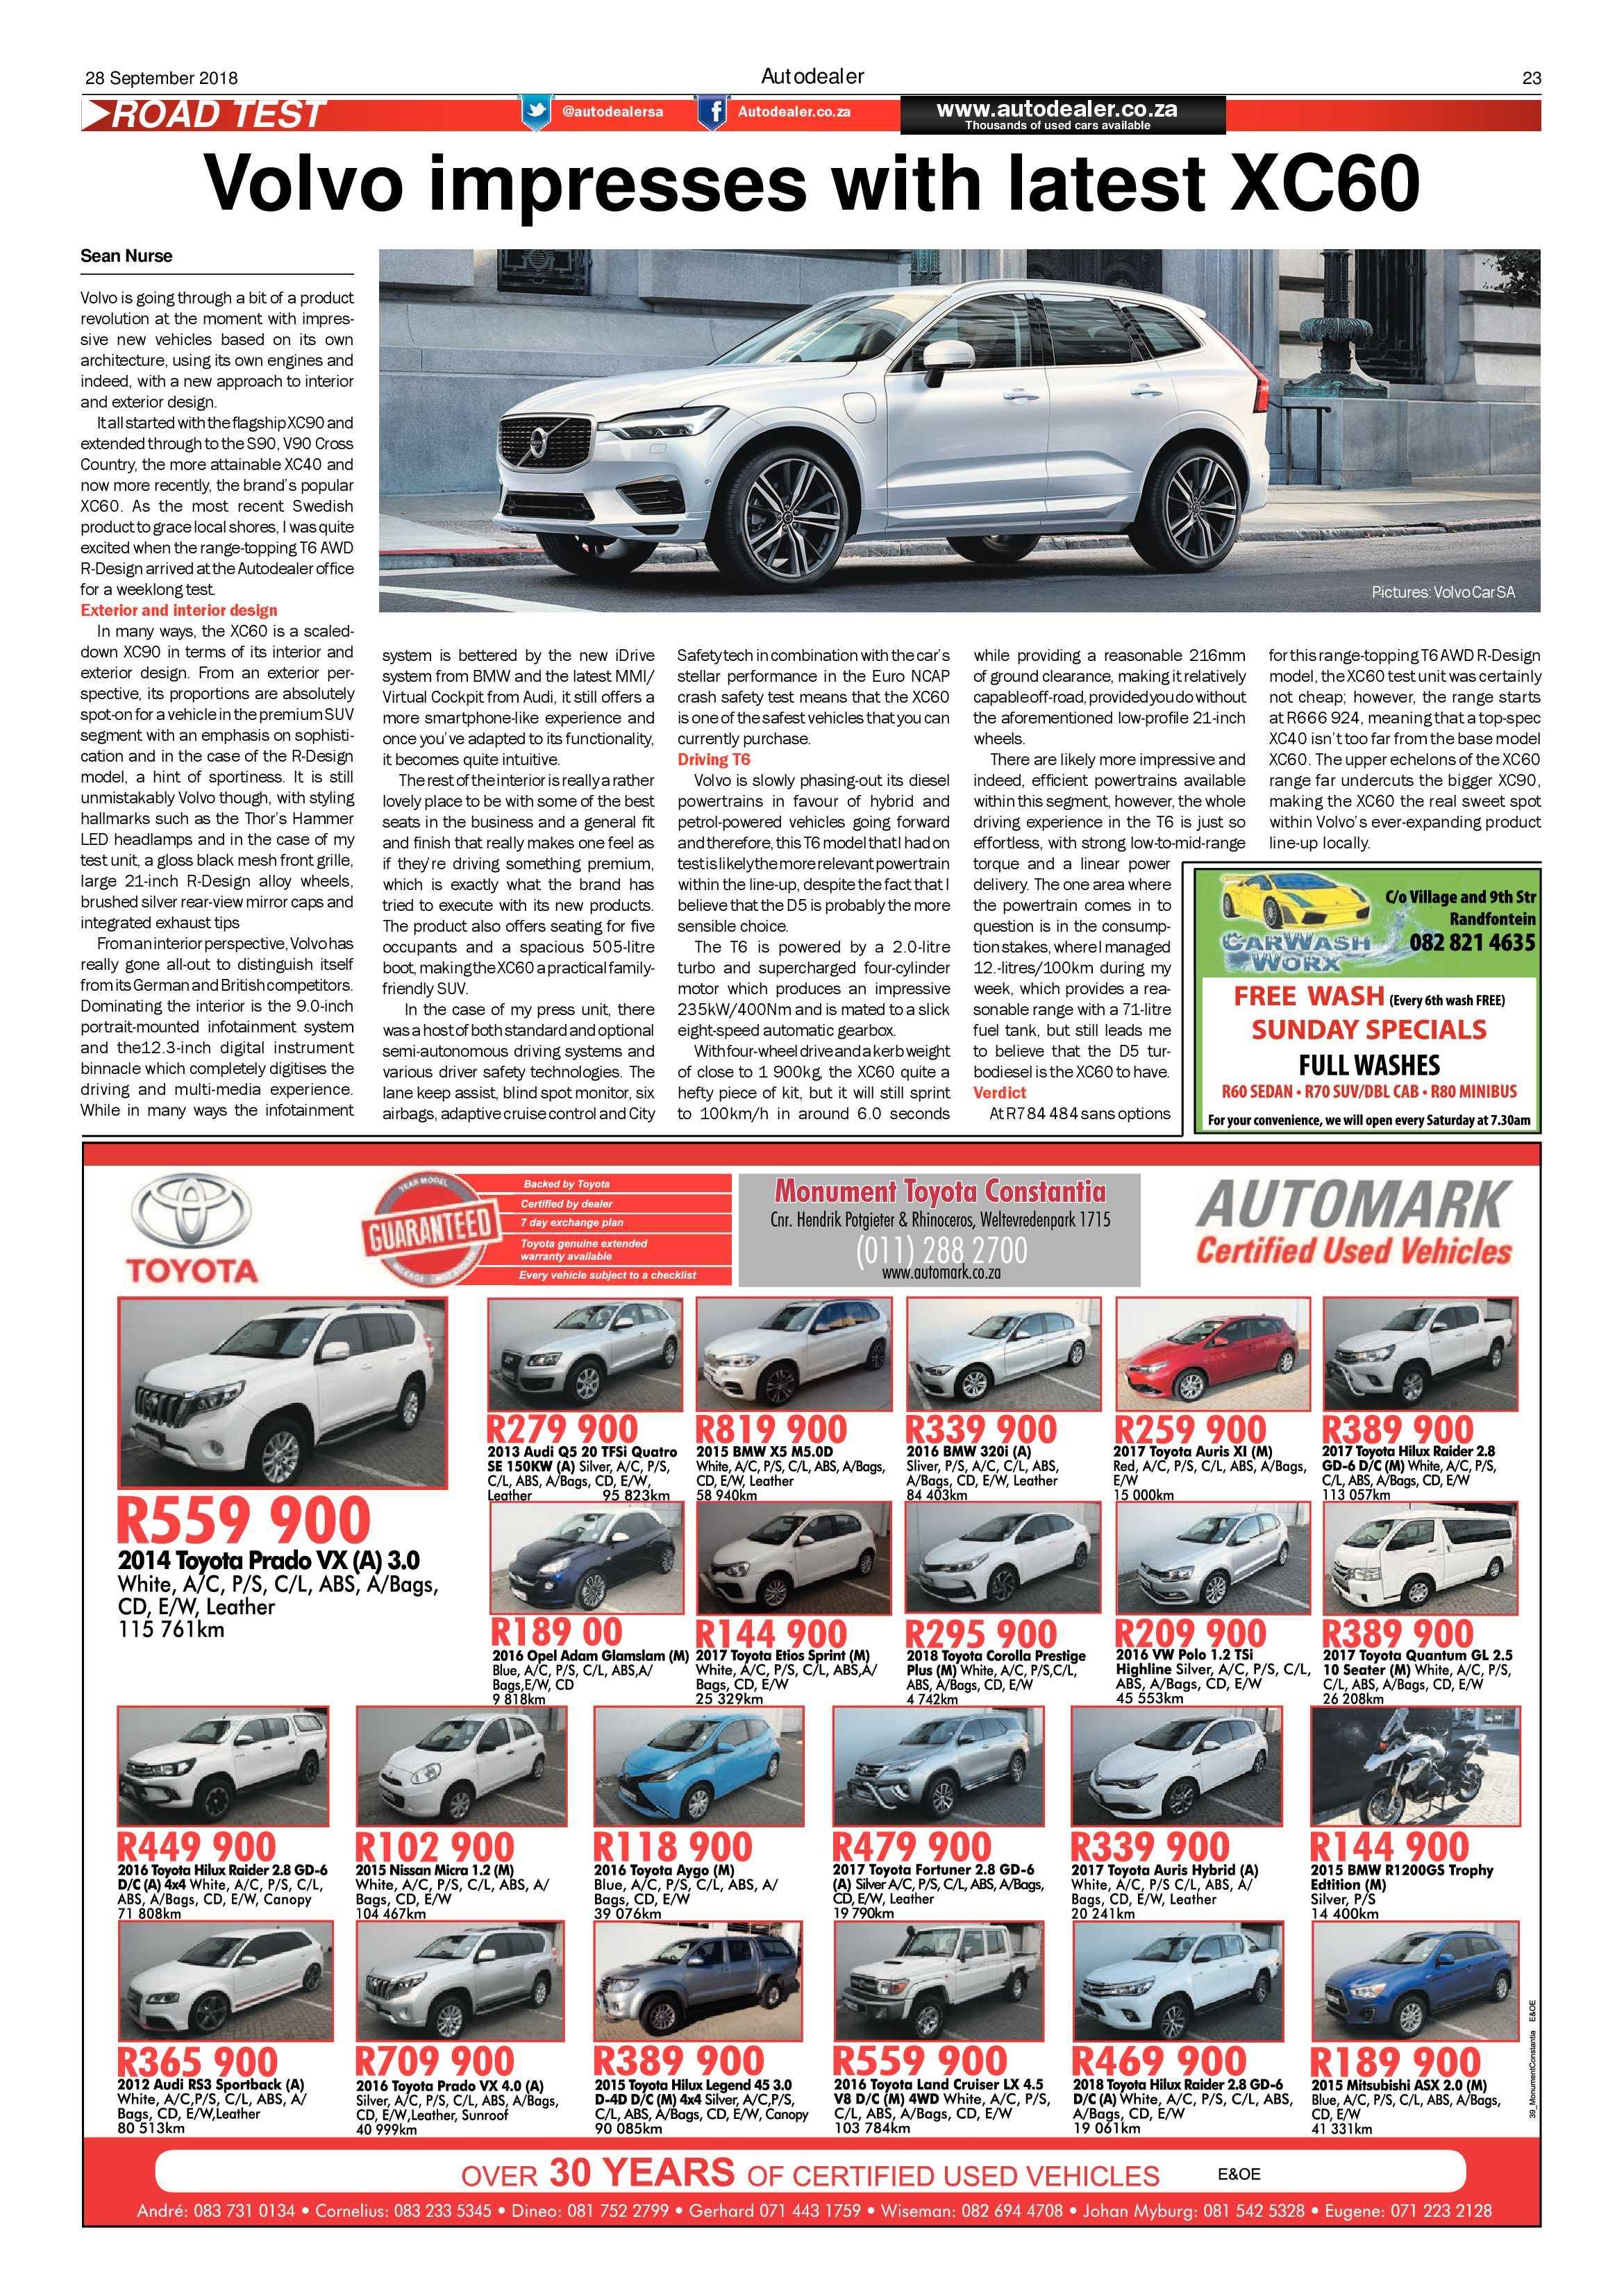 Randfontein Herald 28 September 2018